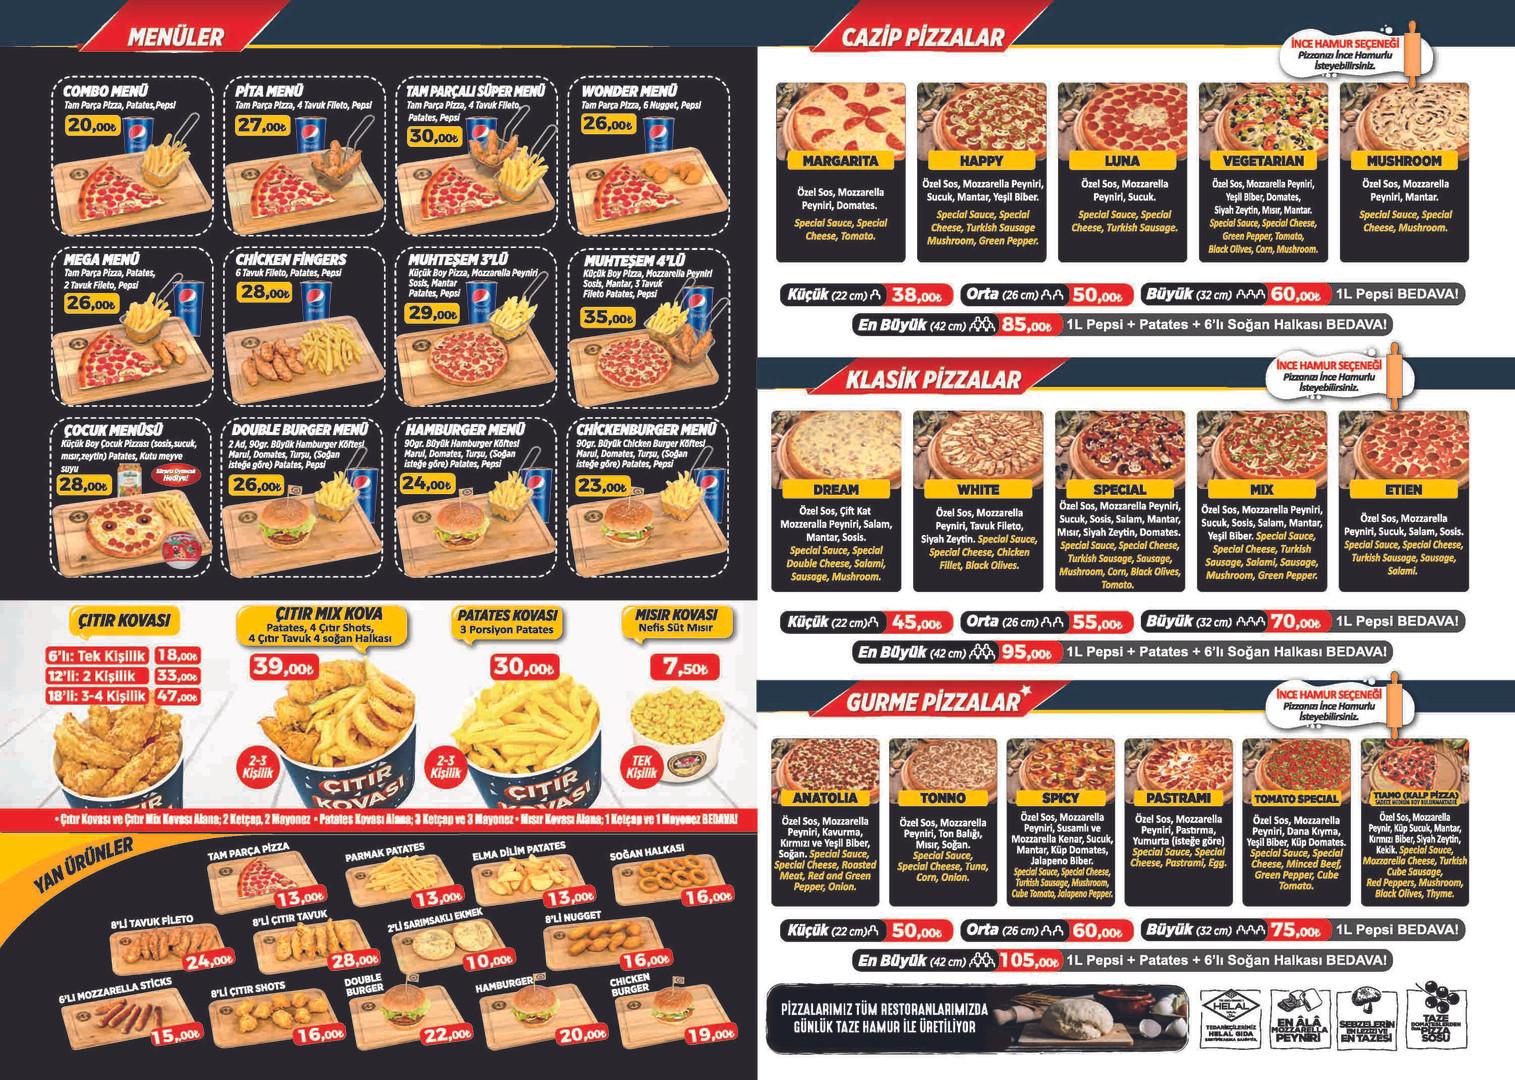 bergama pizza tomato menu (1).jpg